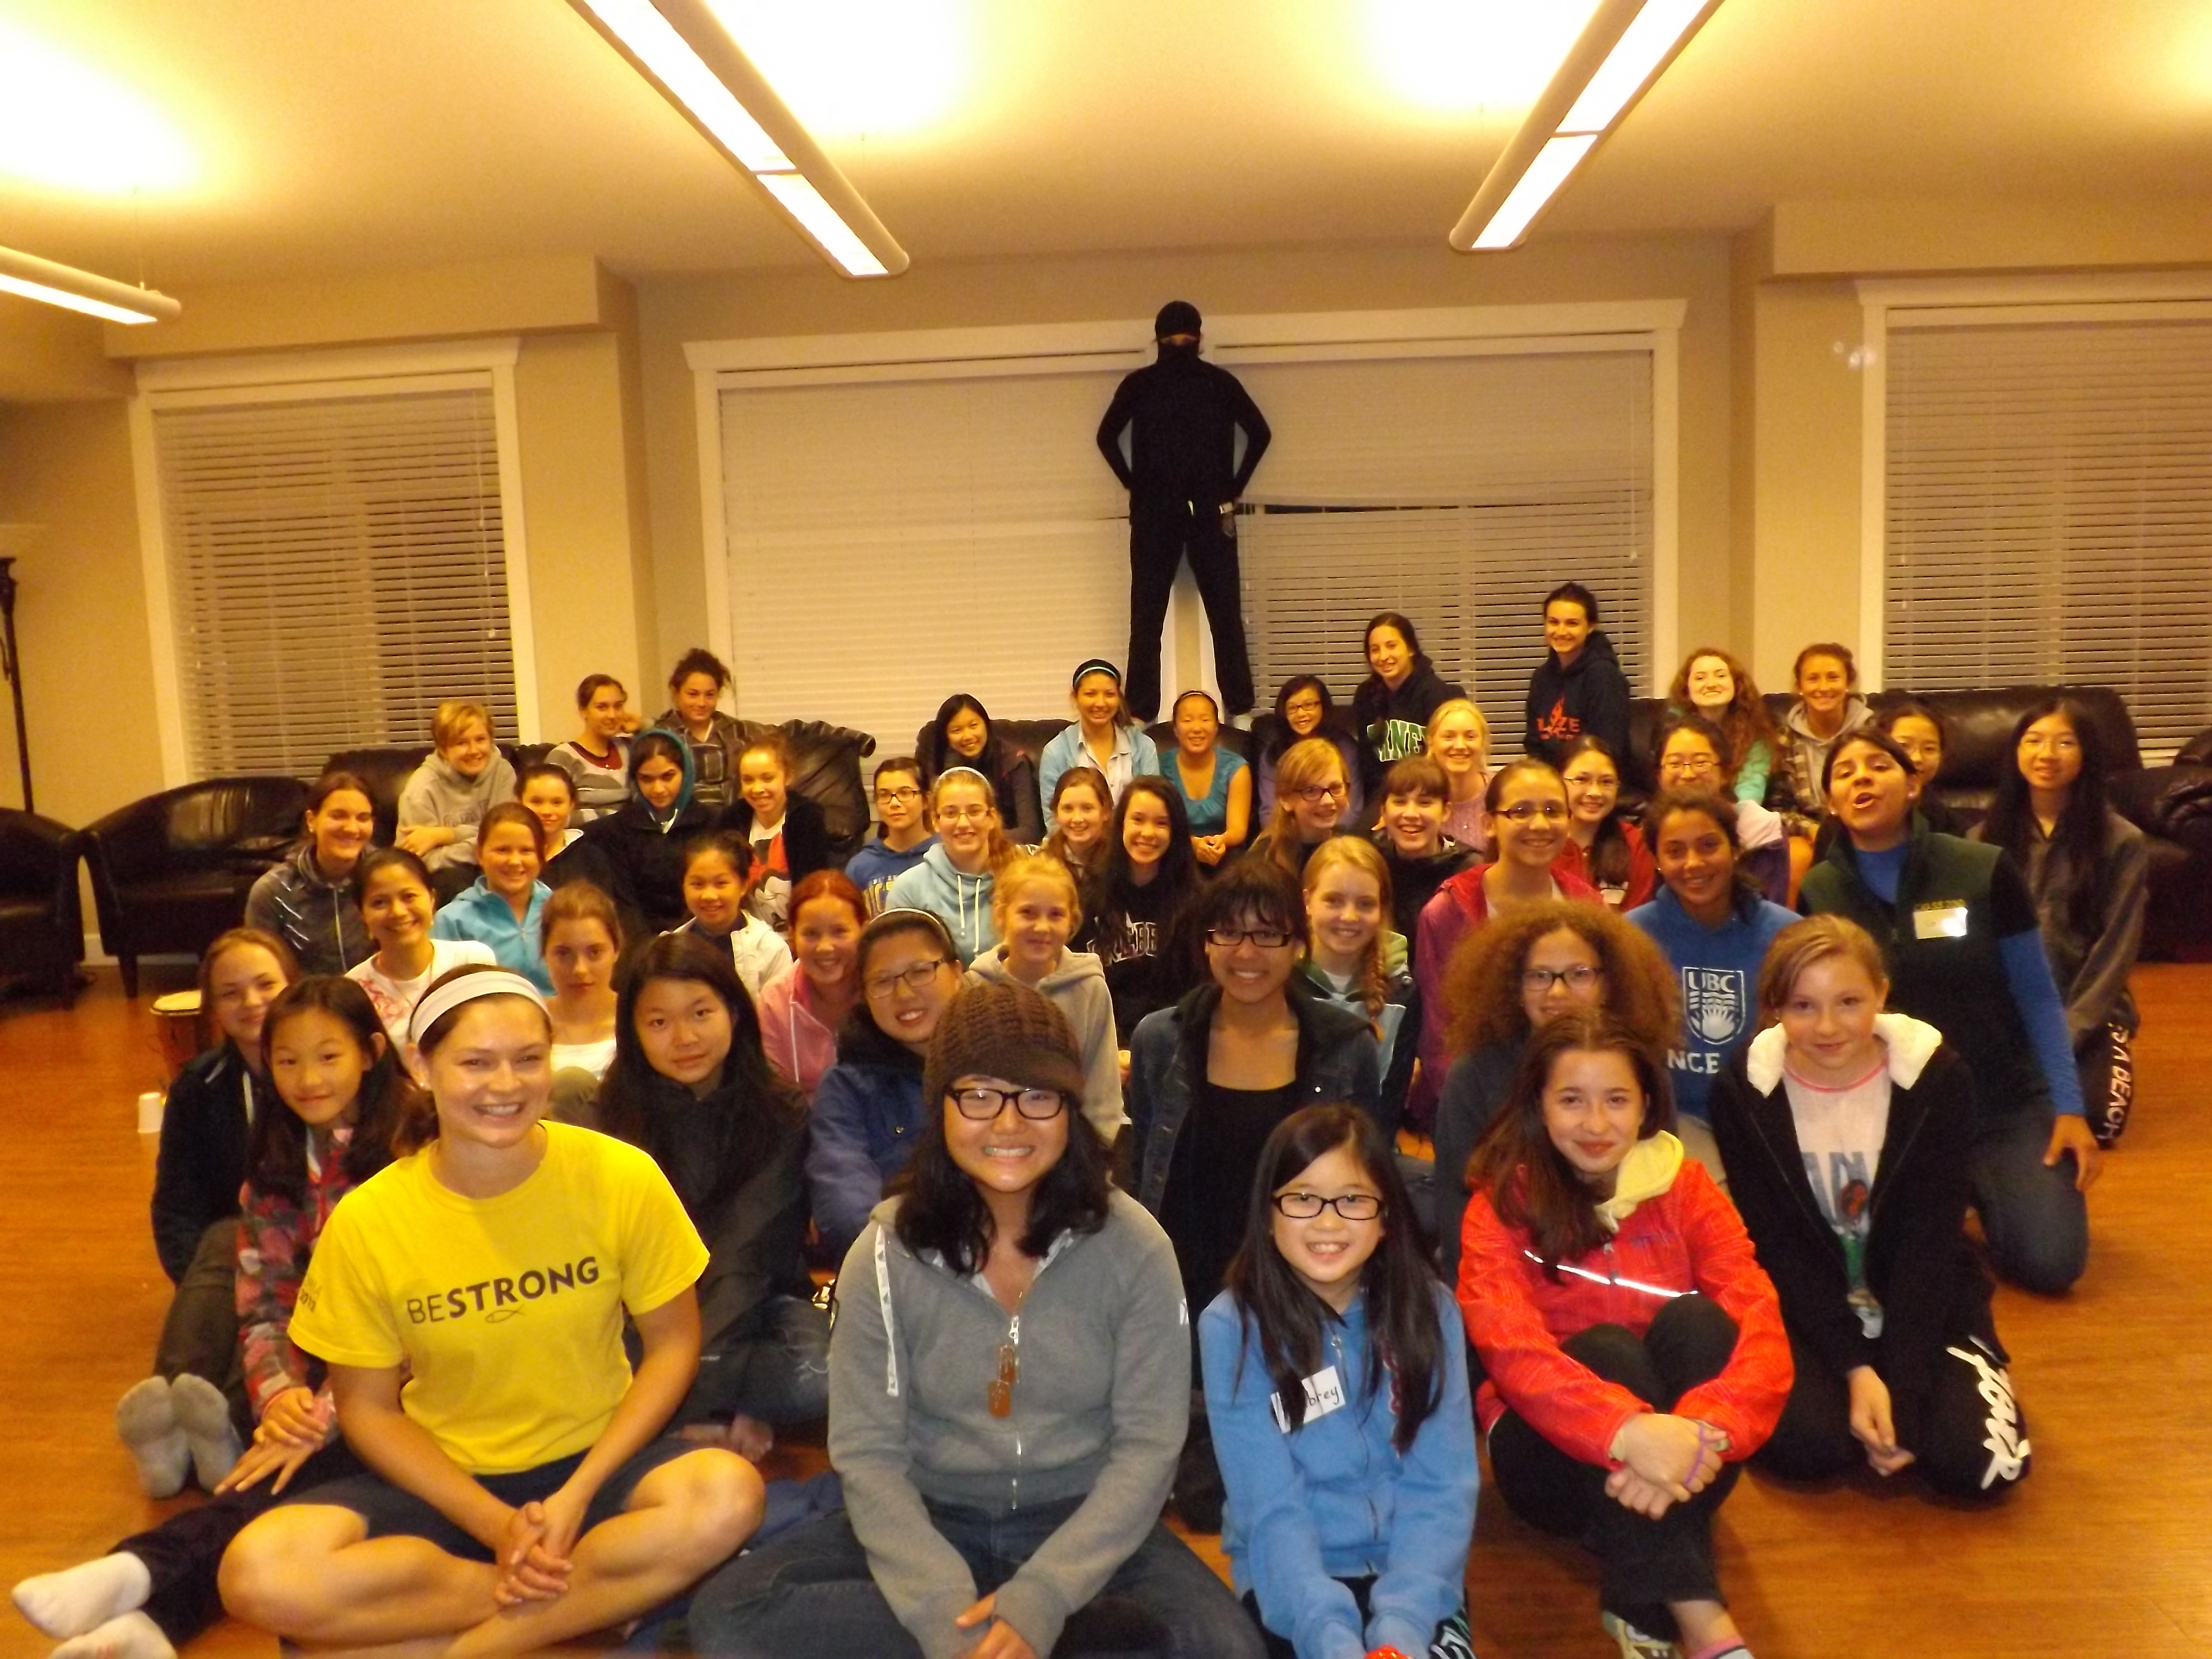 Crestwell Leadership Camp